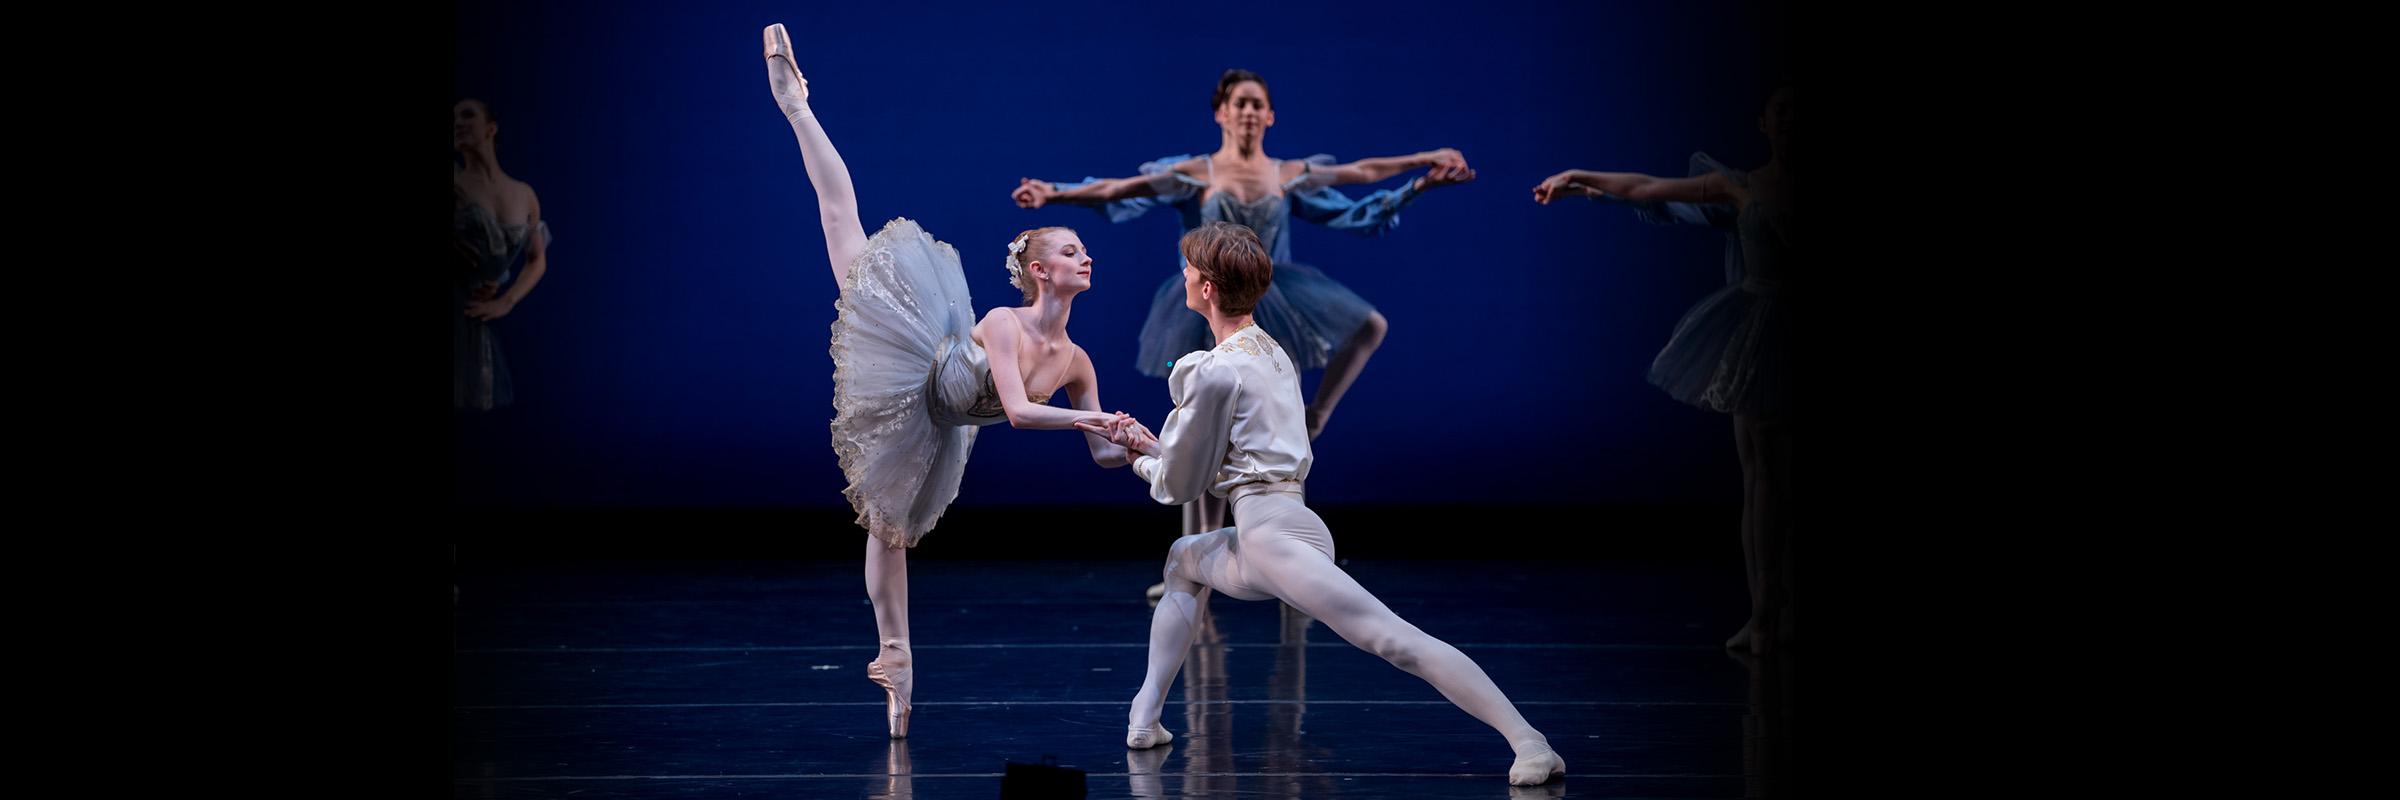 San Francisco Ballet School Students in Tomasson's Ballet D'Isoline. (© Lindsay Thomas)